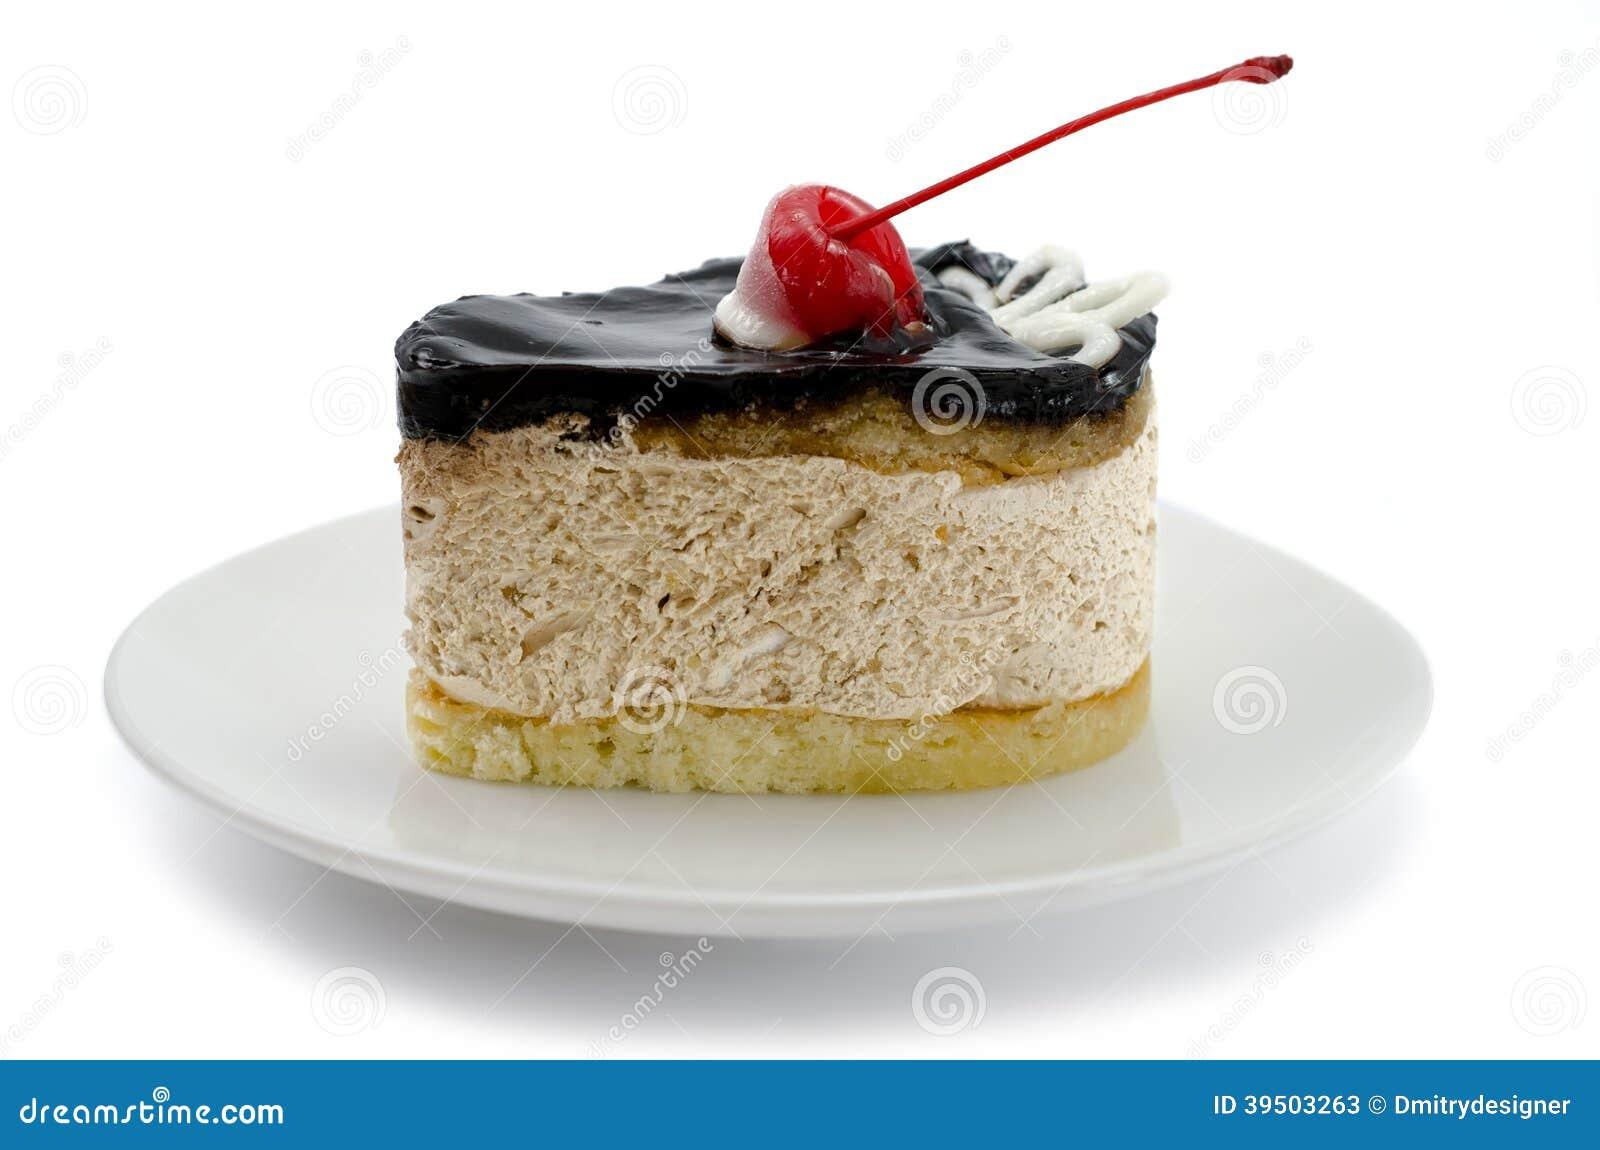 Chocolate cake with cherries close-up